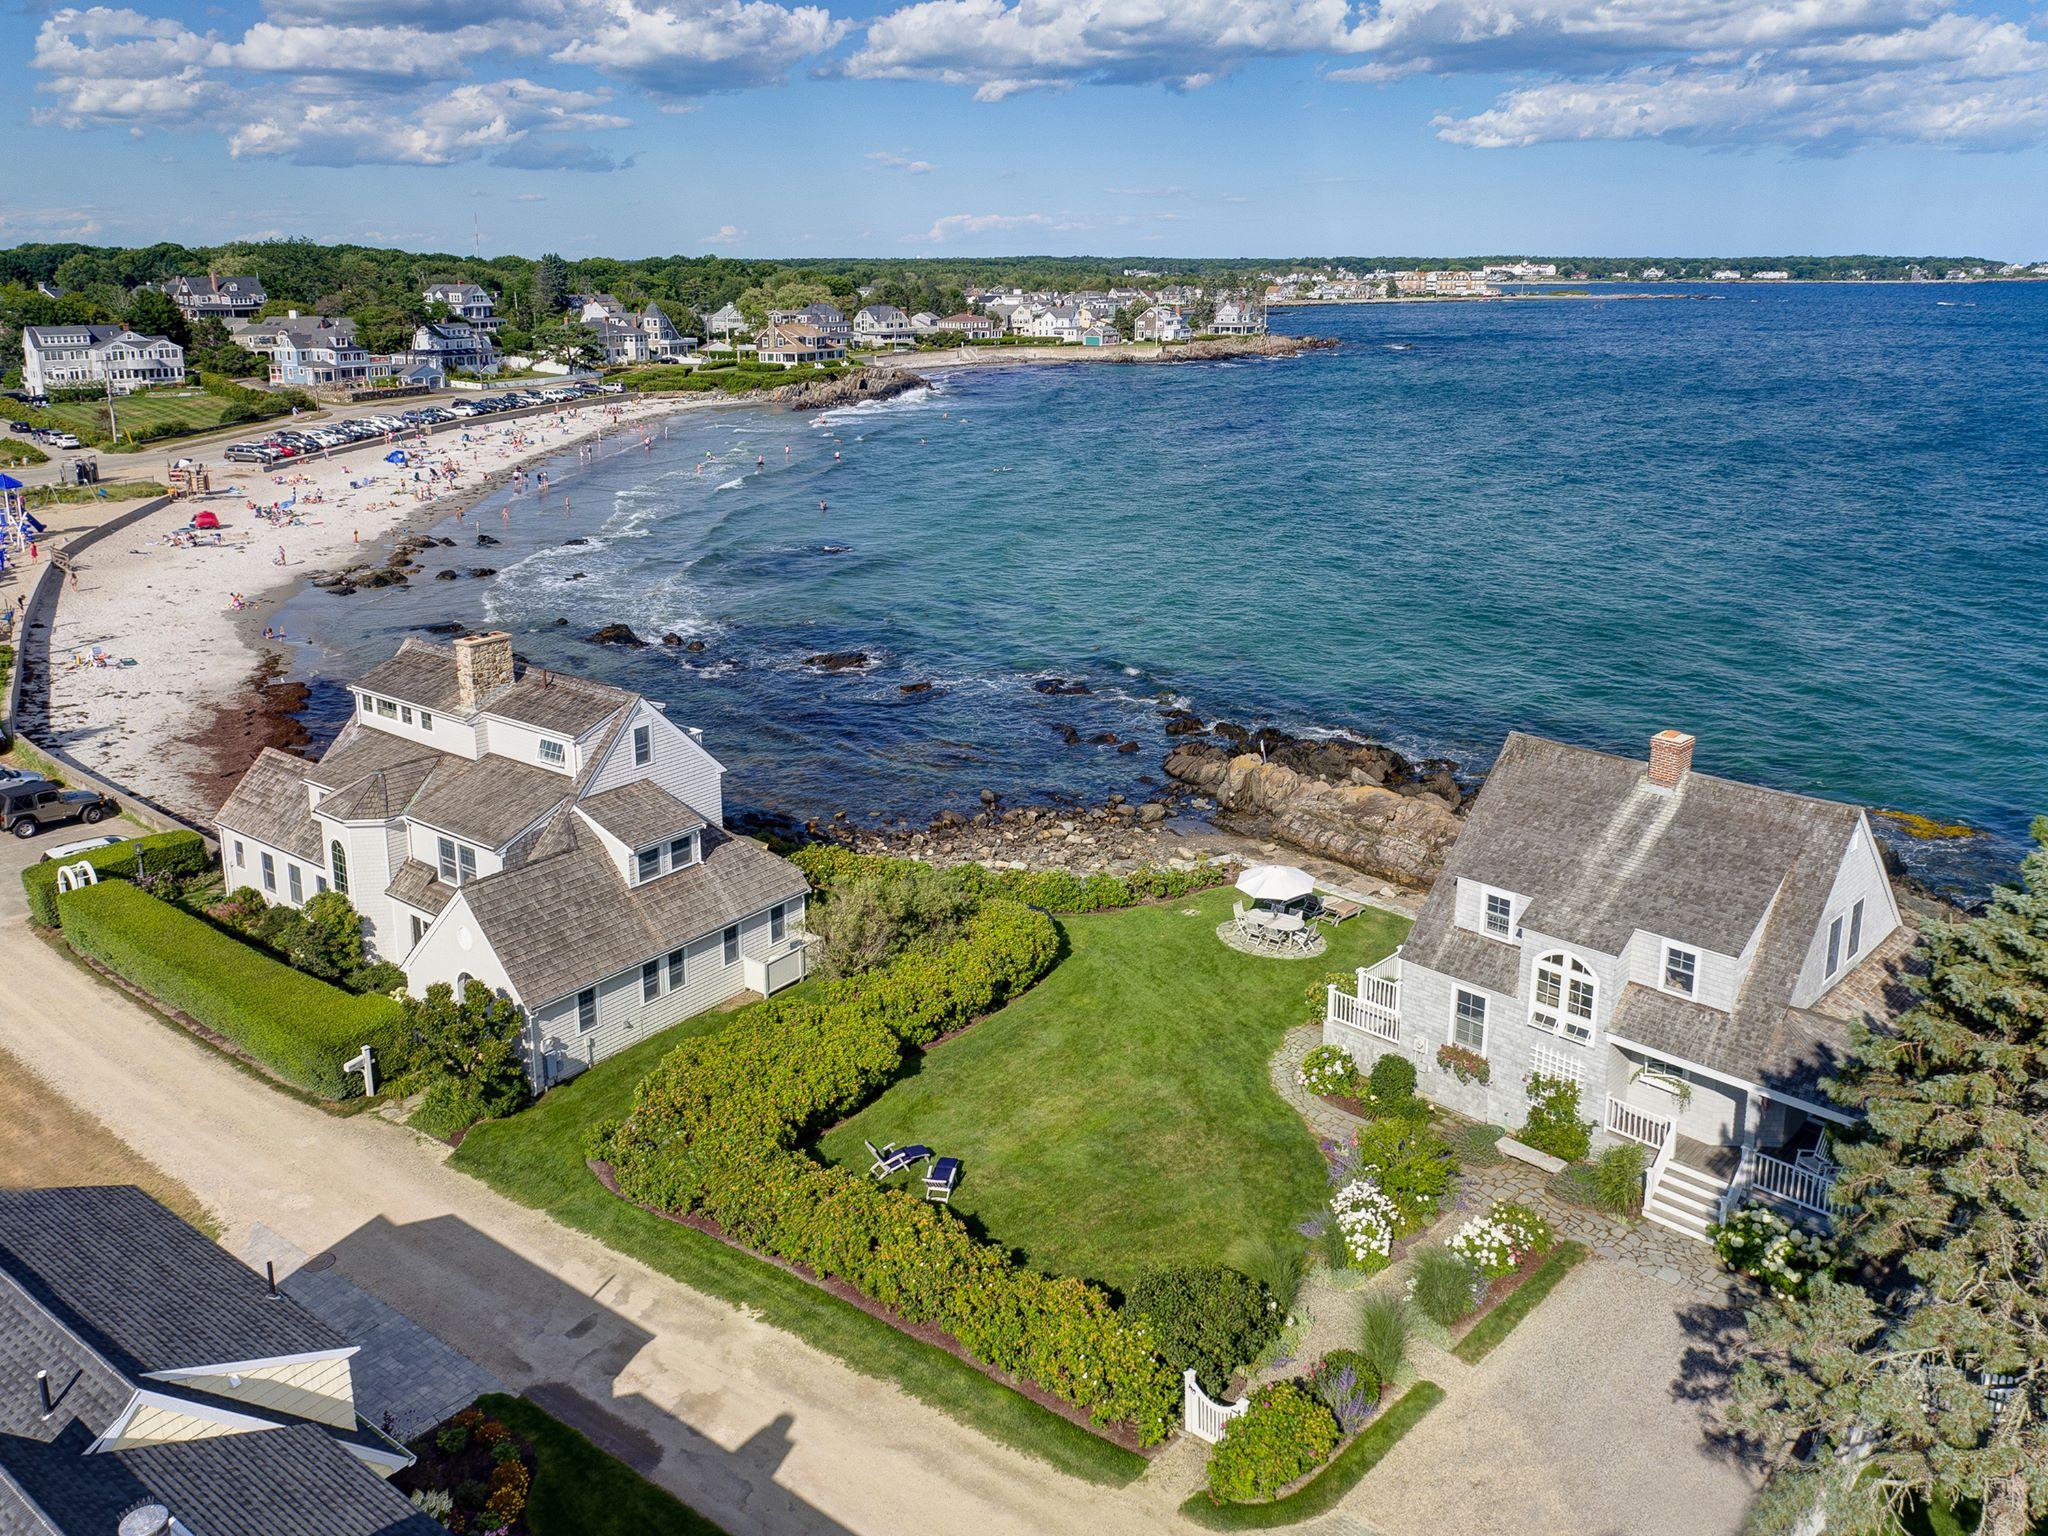 Kennebunk Beach Realty Kennebunk Beach Maine Real Estate Property Management Vacation Rentals